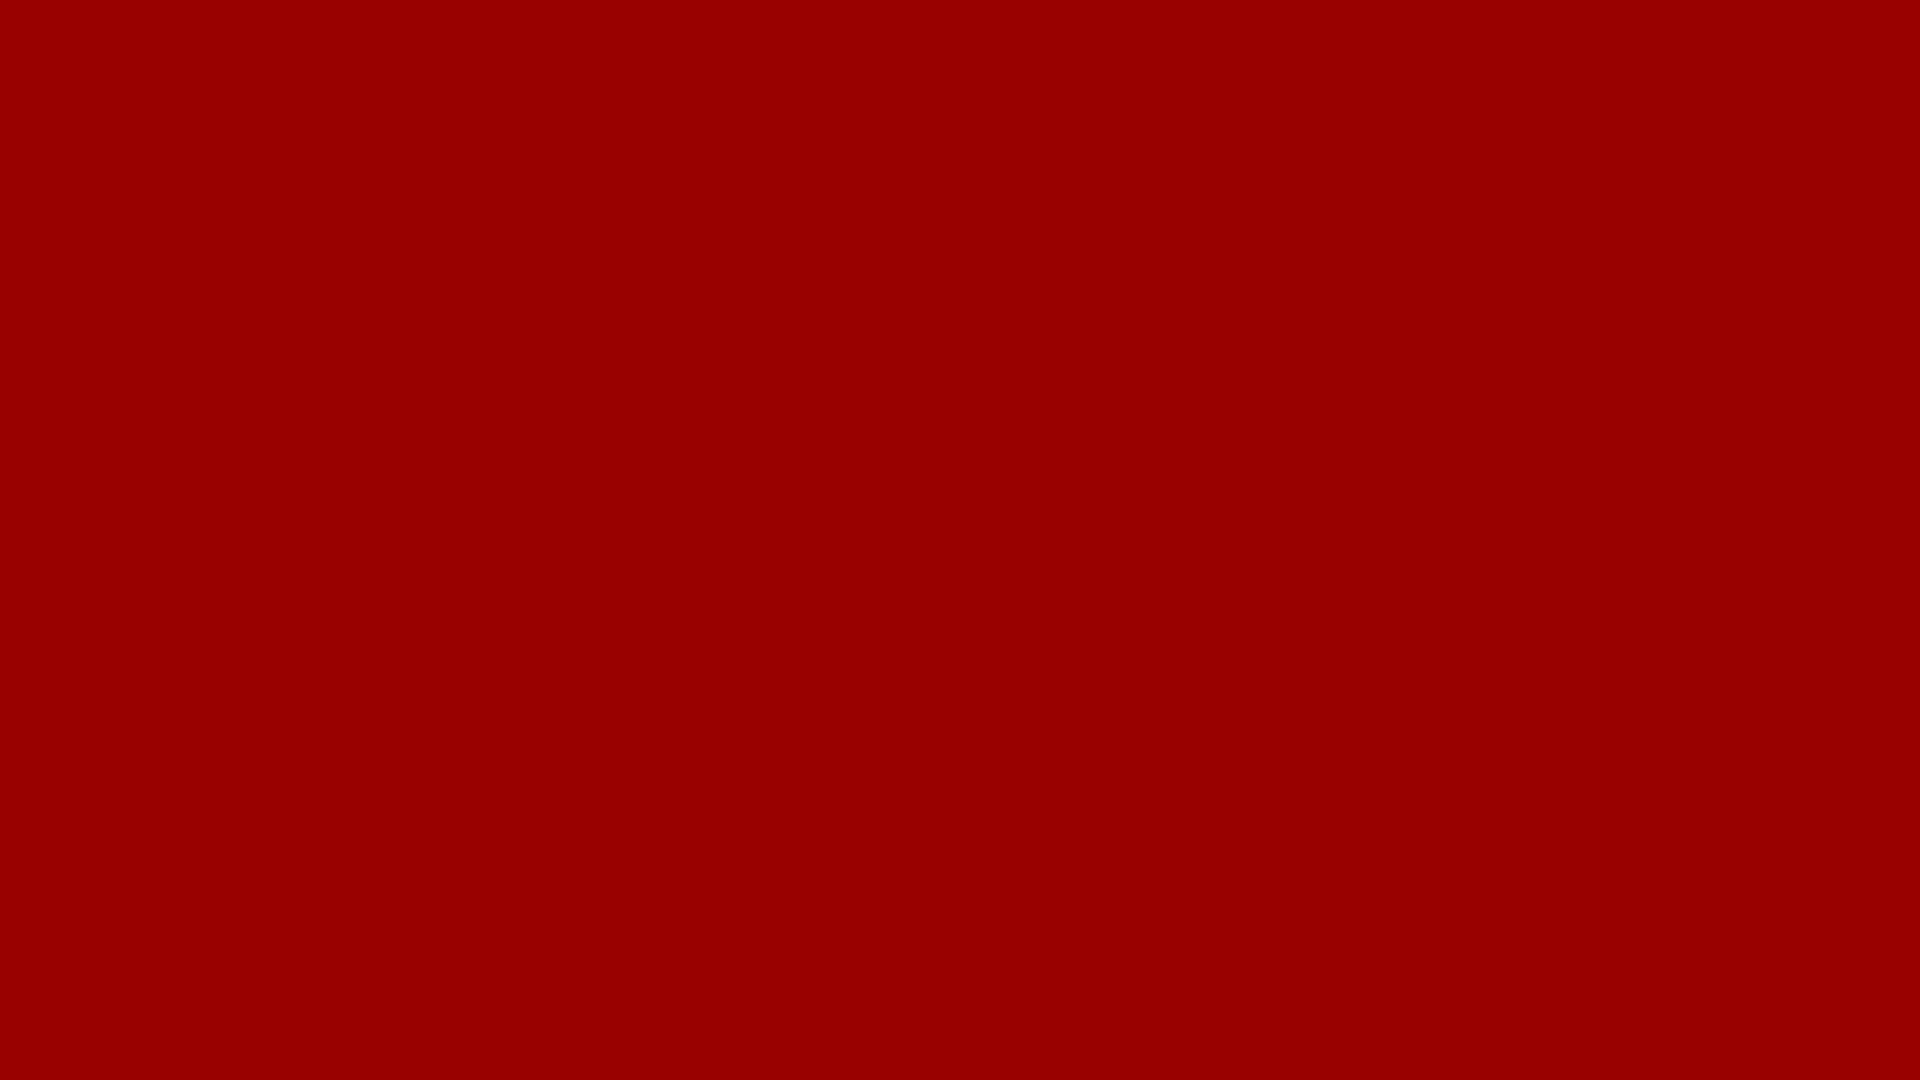 1920x1080 Stizza Solid Color Background